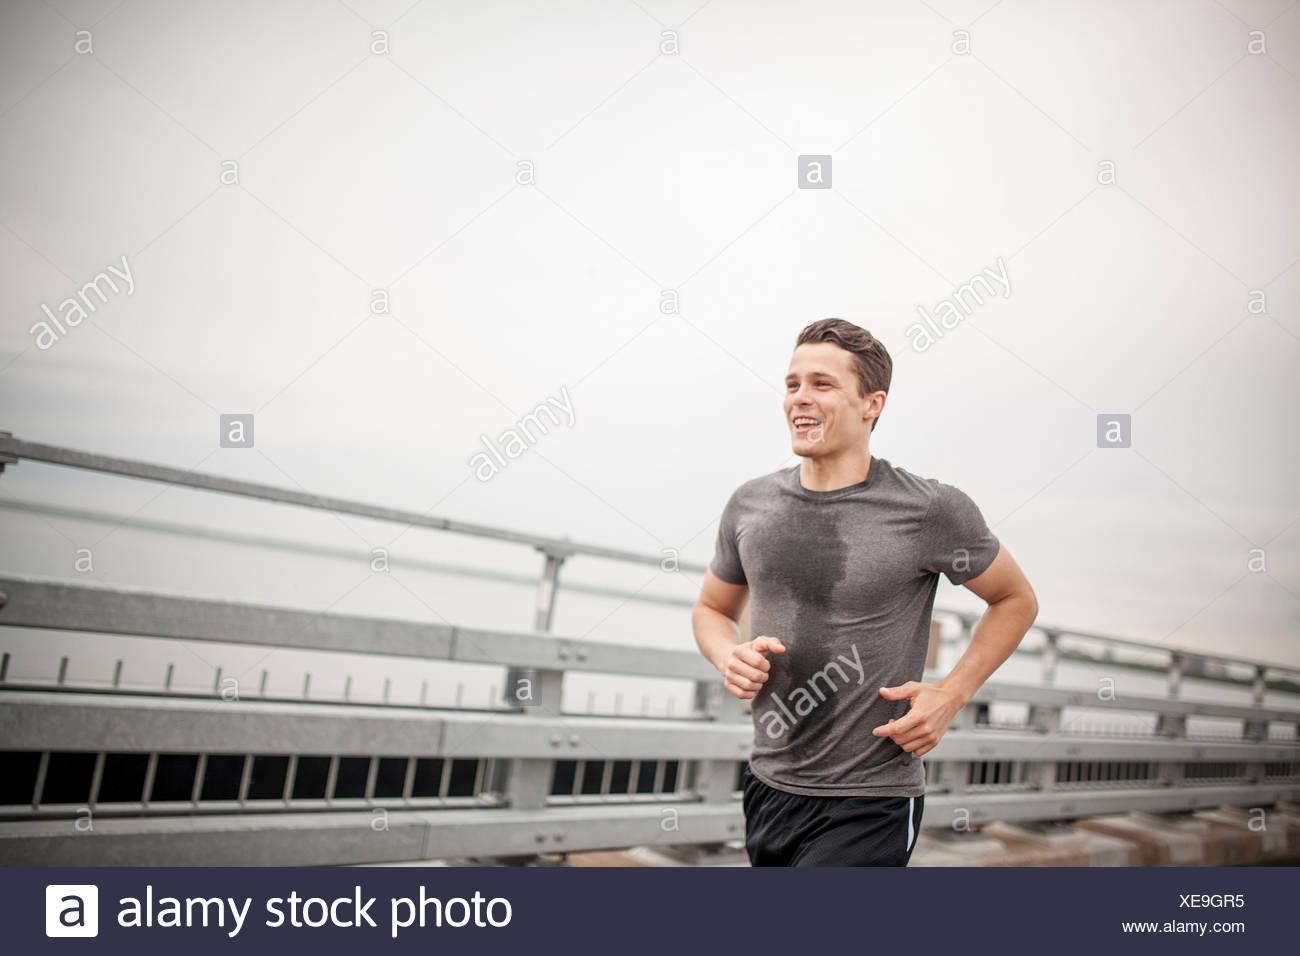 Young man jogging Photo Stock